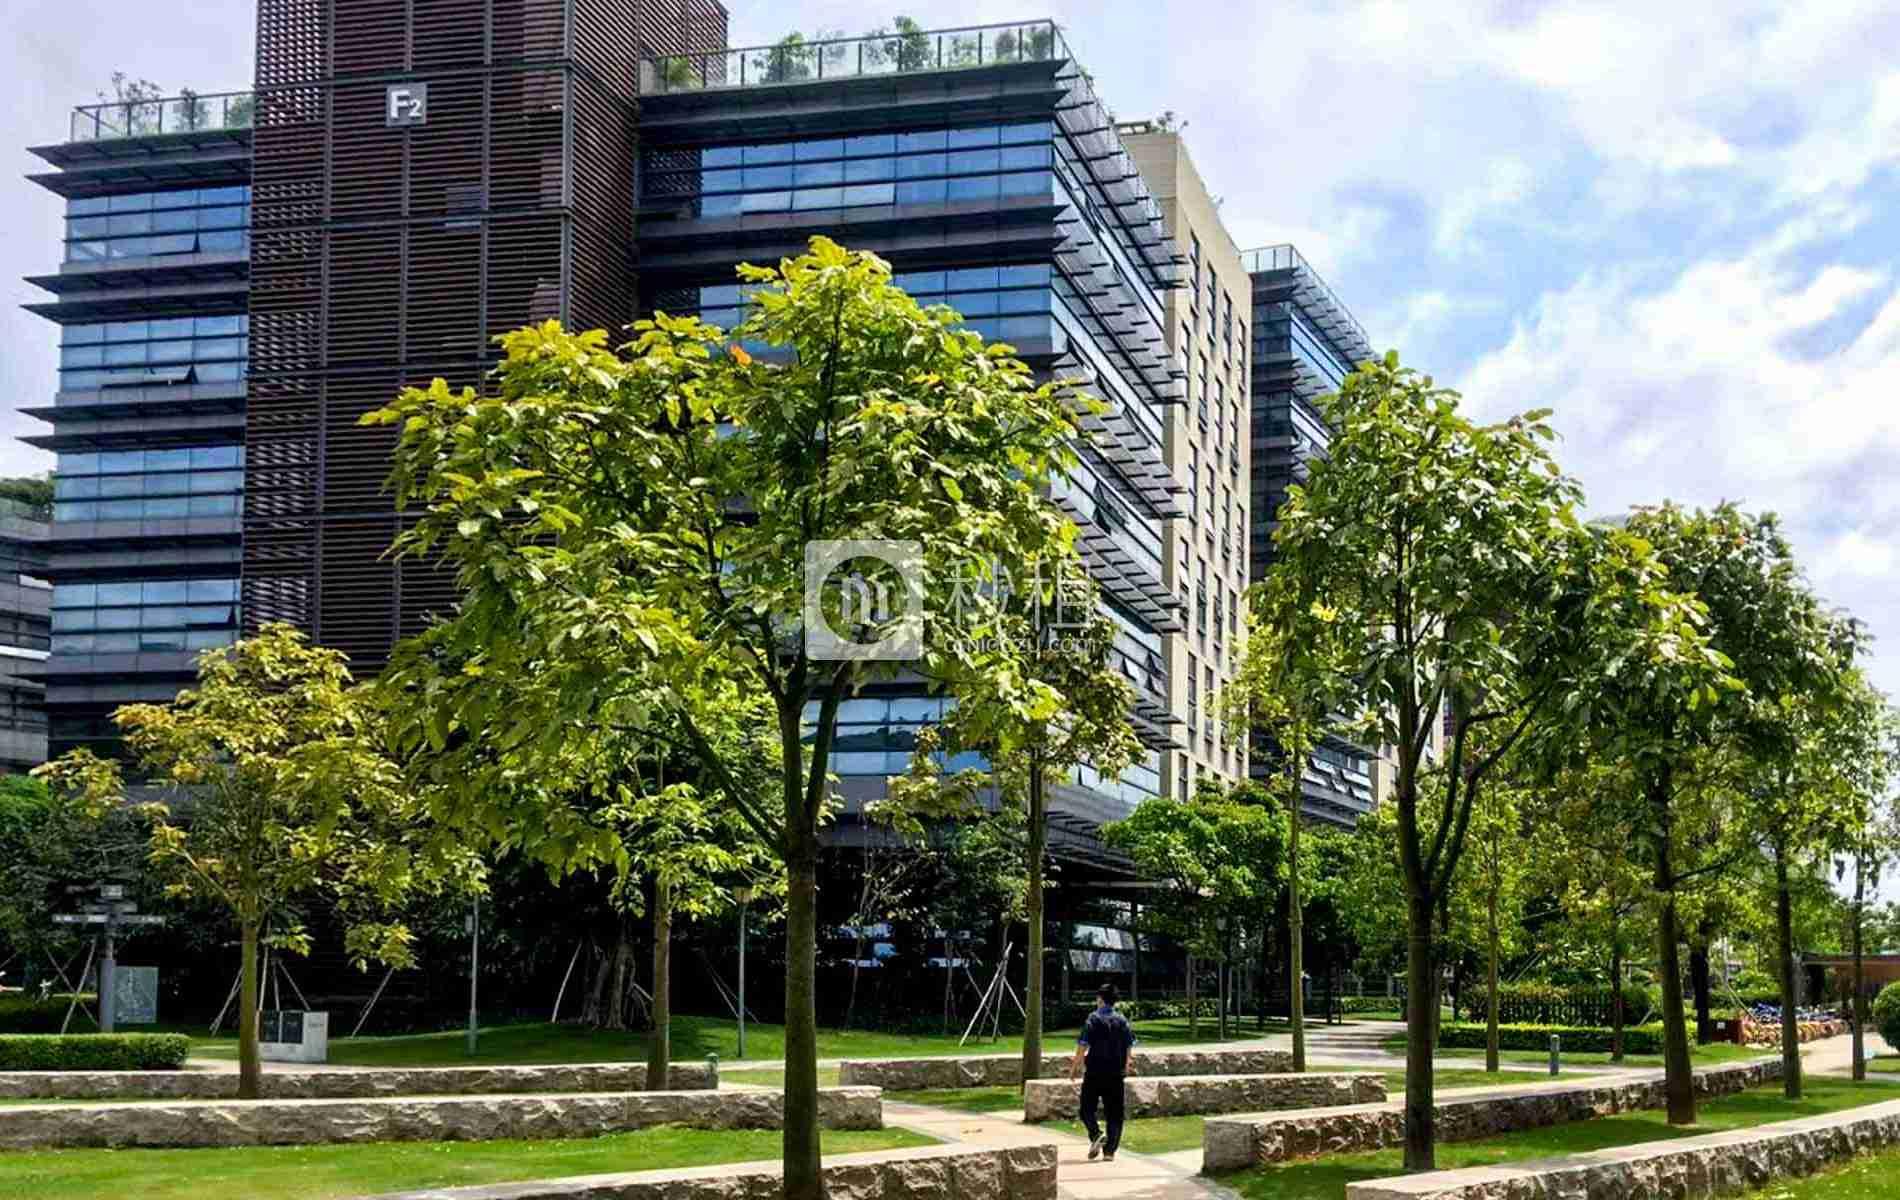 TCL科学园国际E城写字楼出租/招租/租赁,TCL科学园国际E城办公室出租/招租/租赁